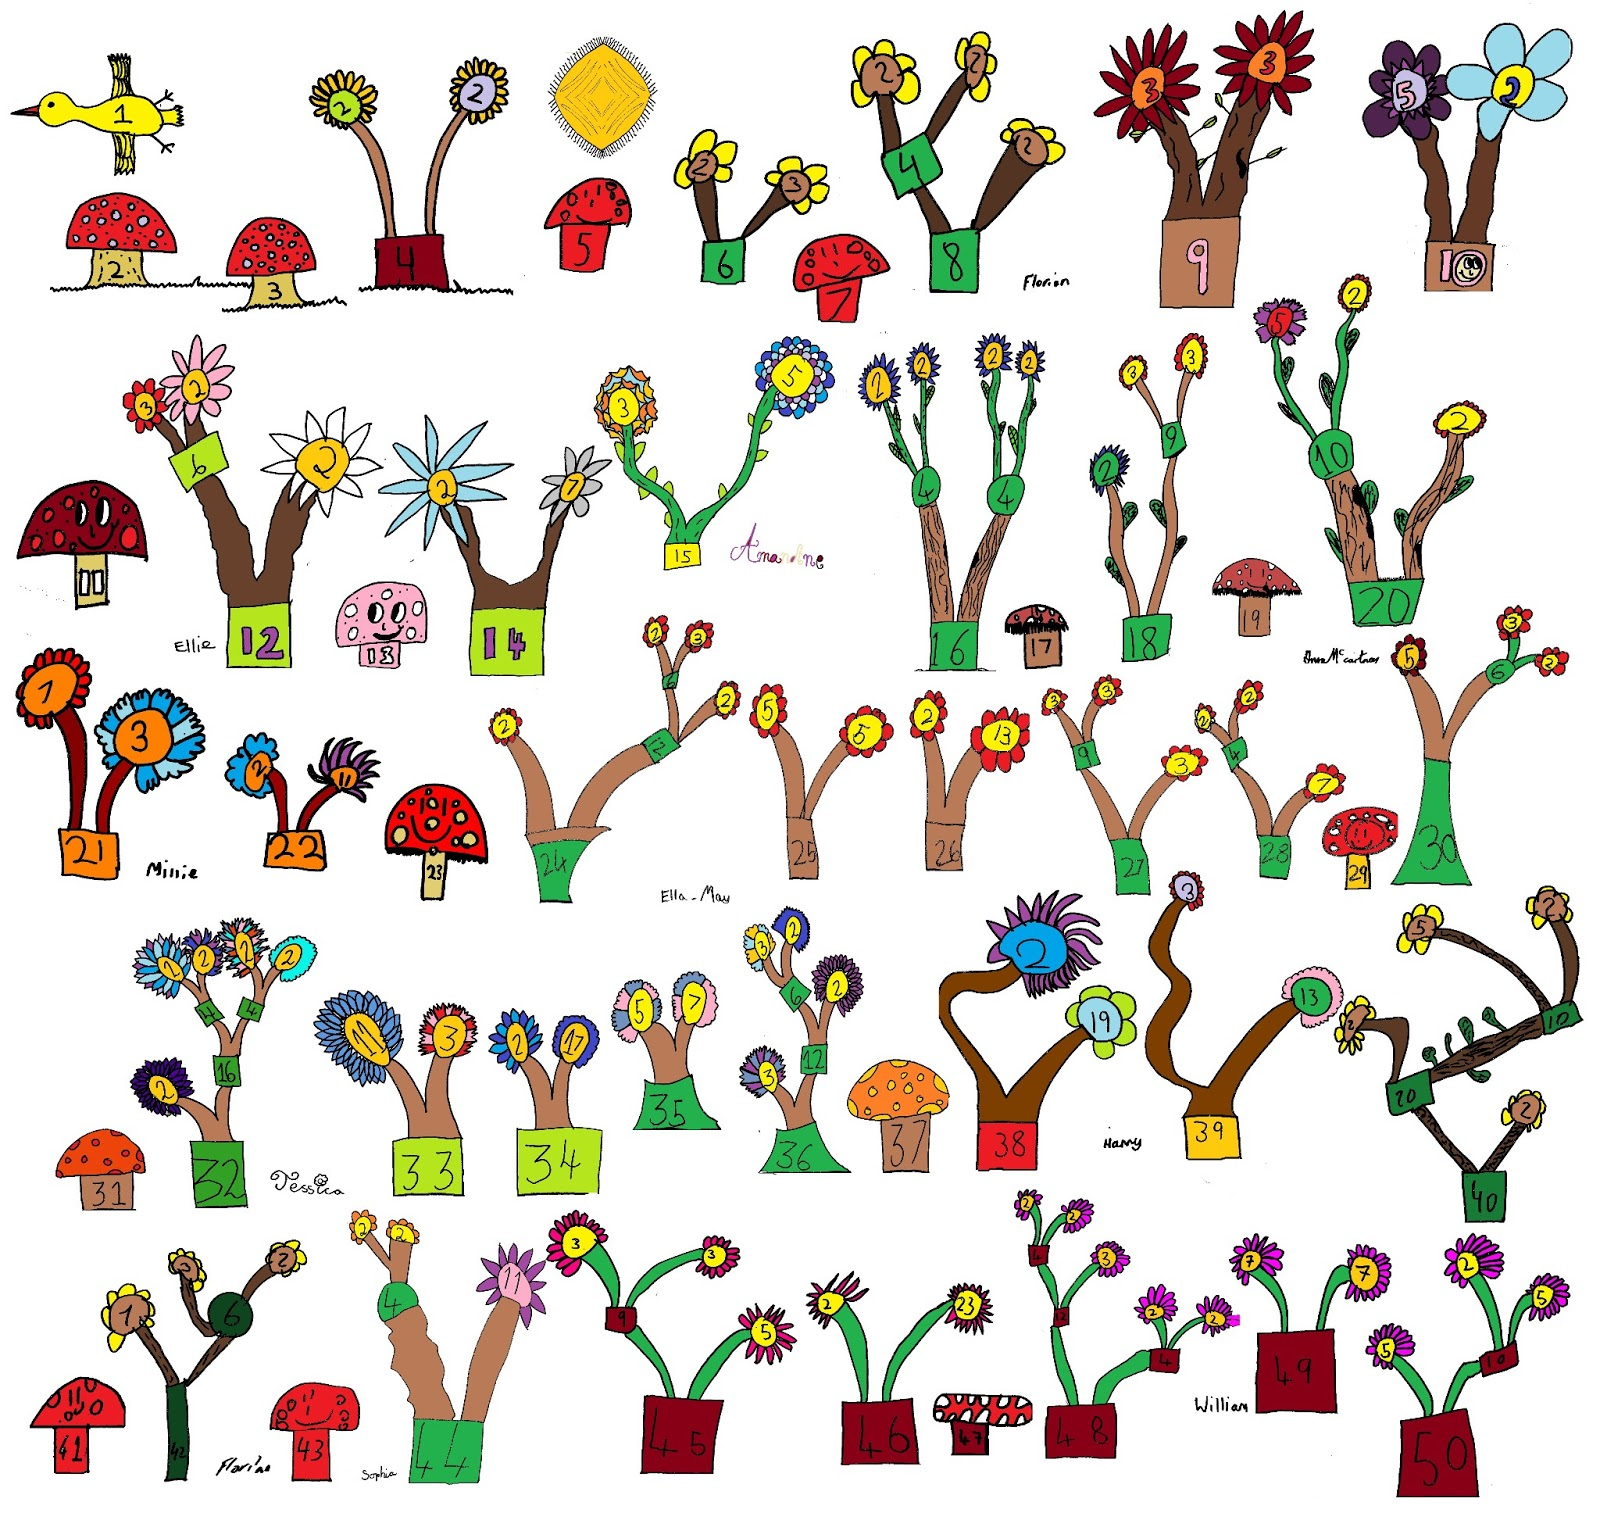 Free Worksheets prime numbers 1 100 worksheet : pinkmathematics: Important factors